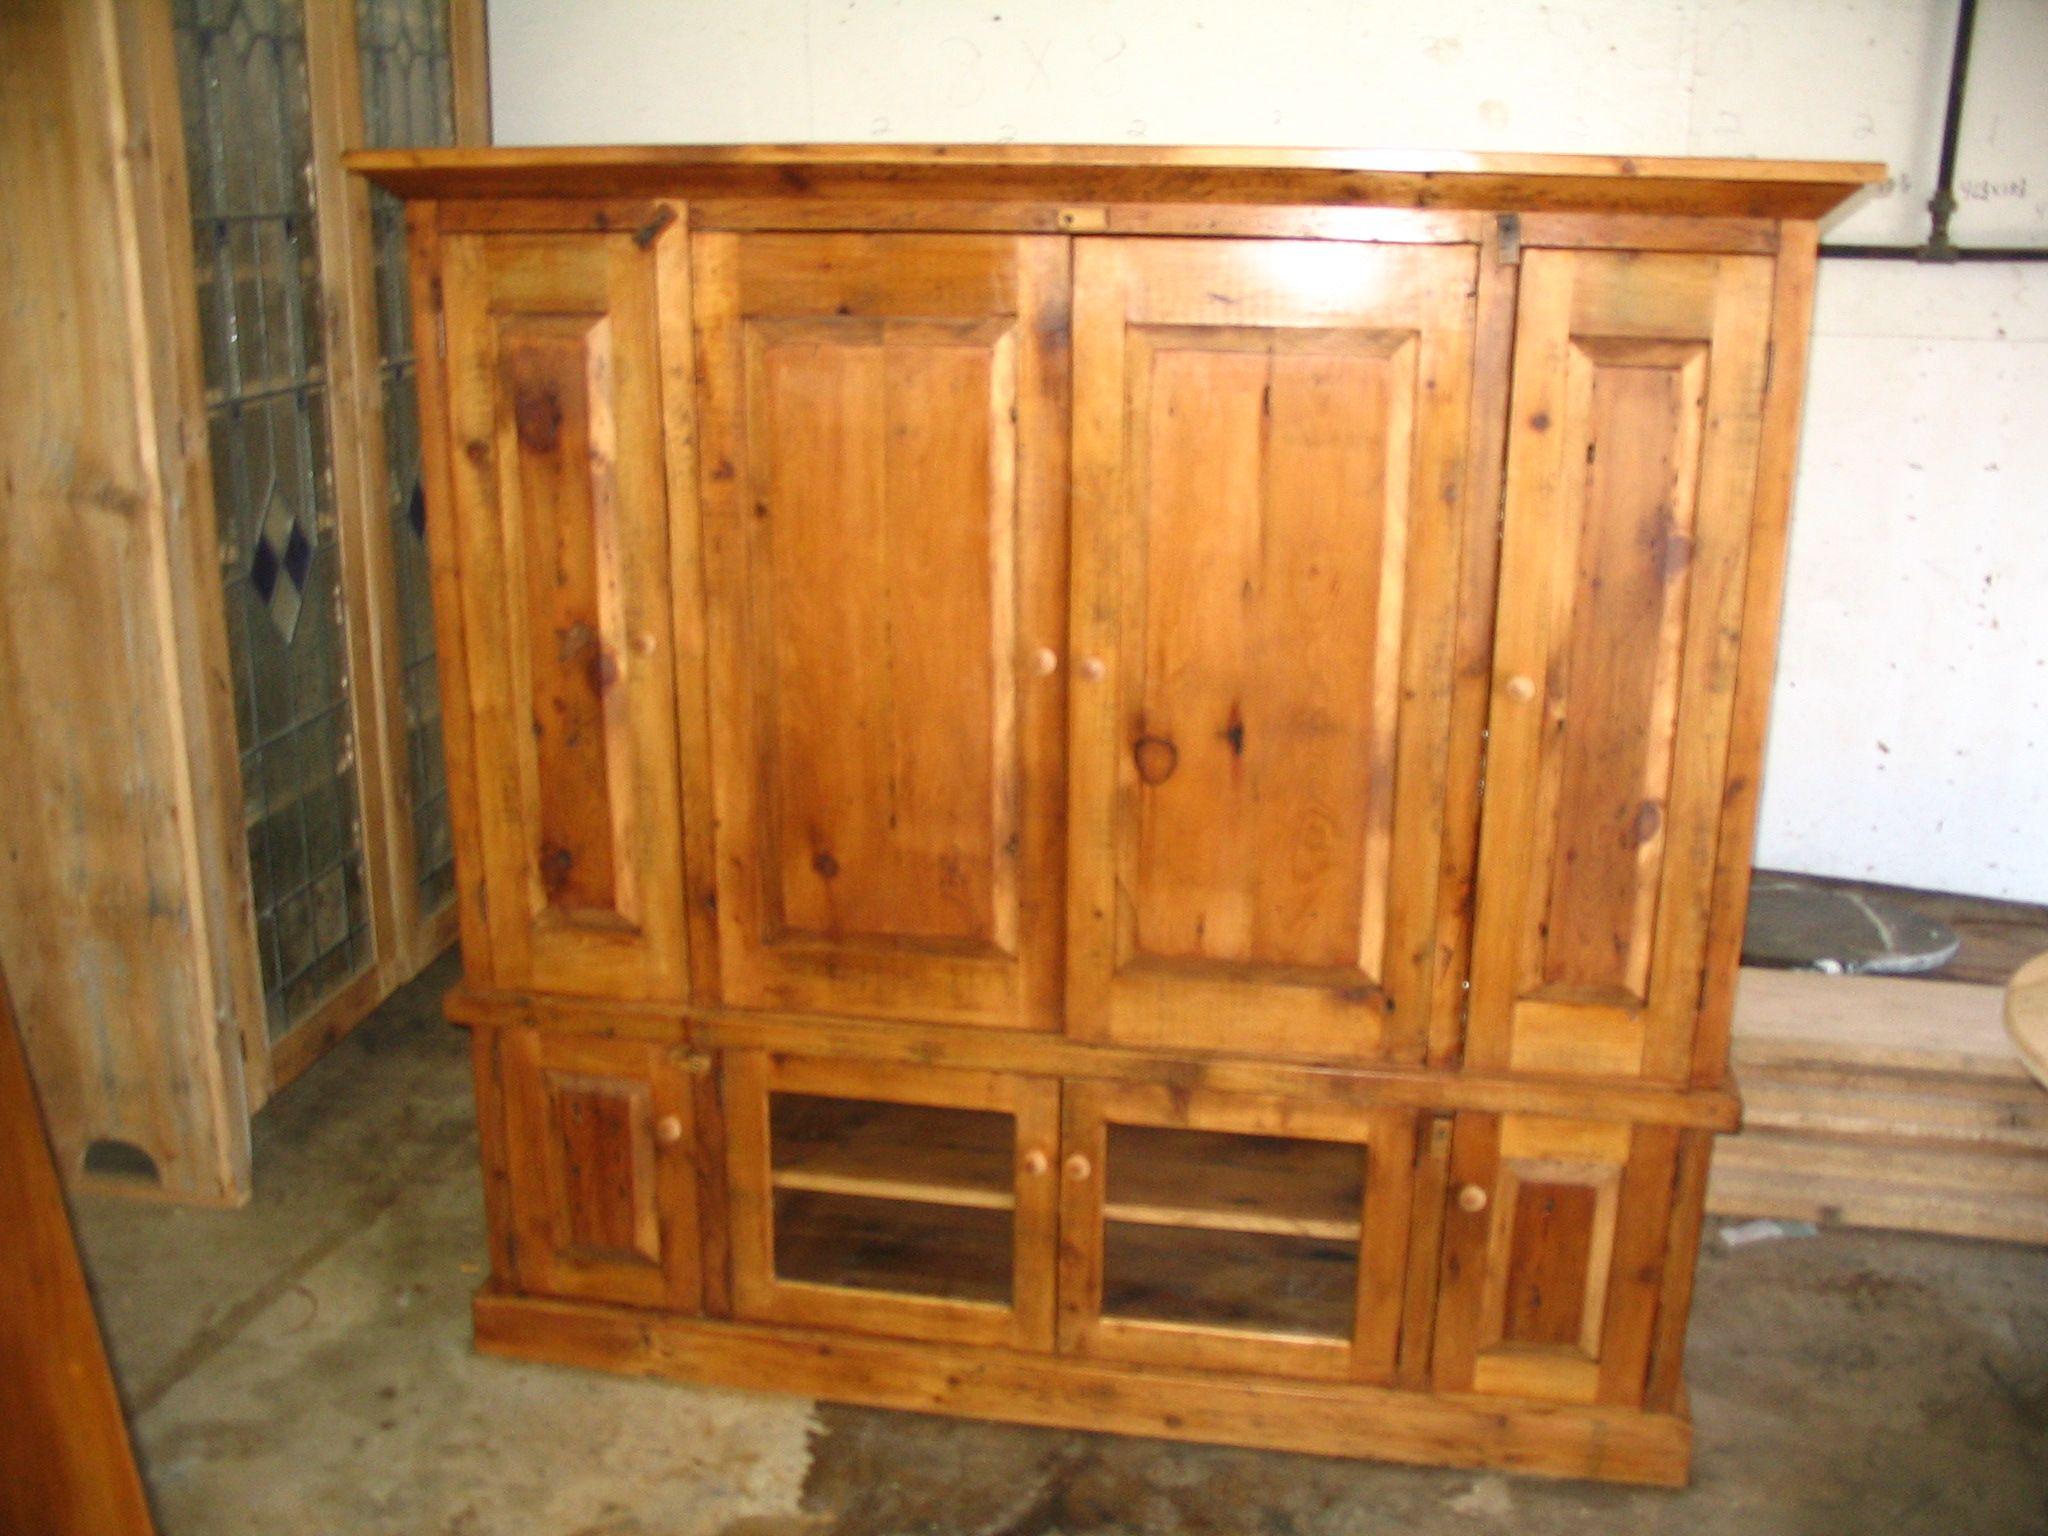 barn wood entertainment center Reclaimed barn wood